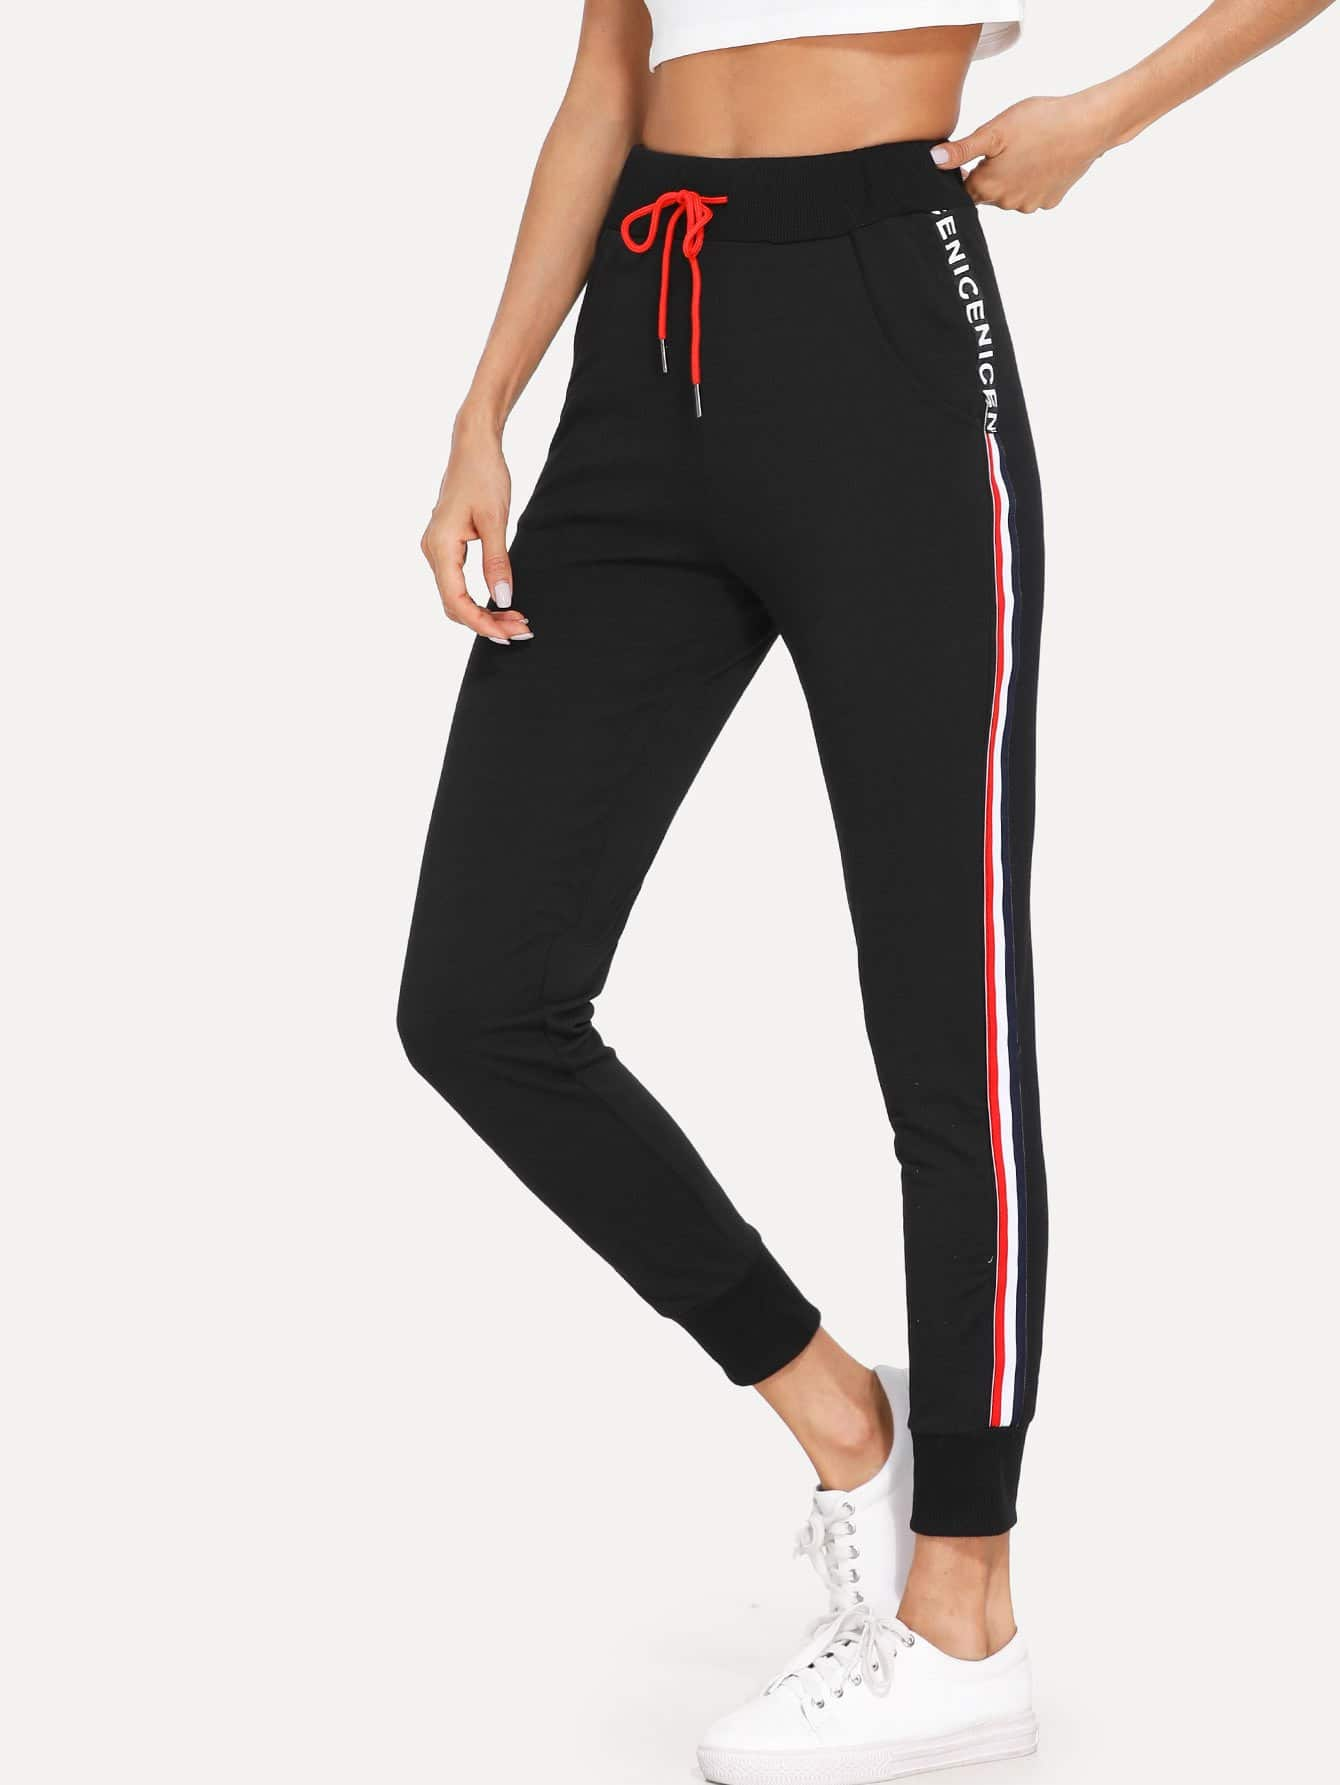 Drawstring Waist Striped Tape Side Sweatpants striped tape side cuffed pants